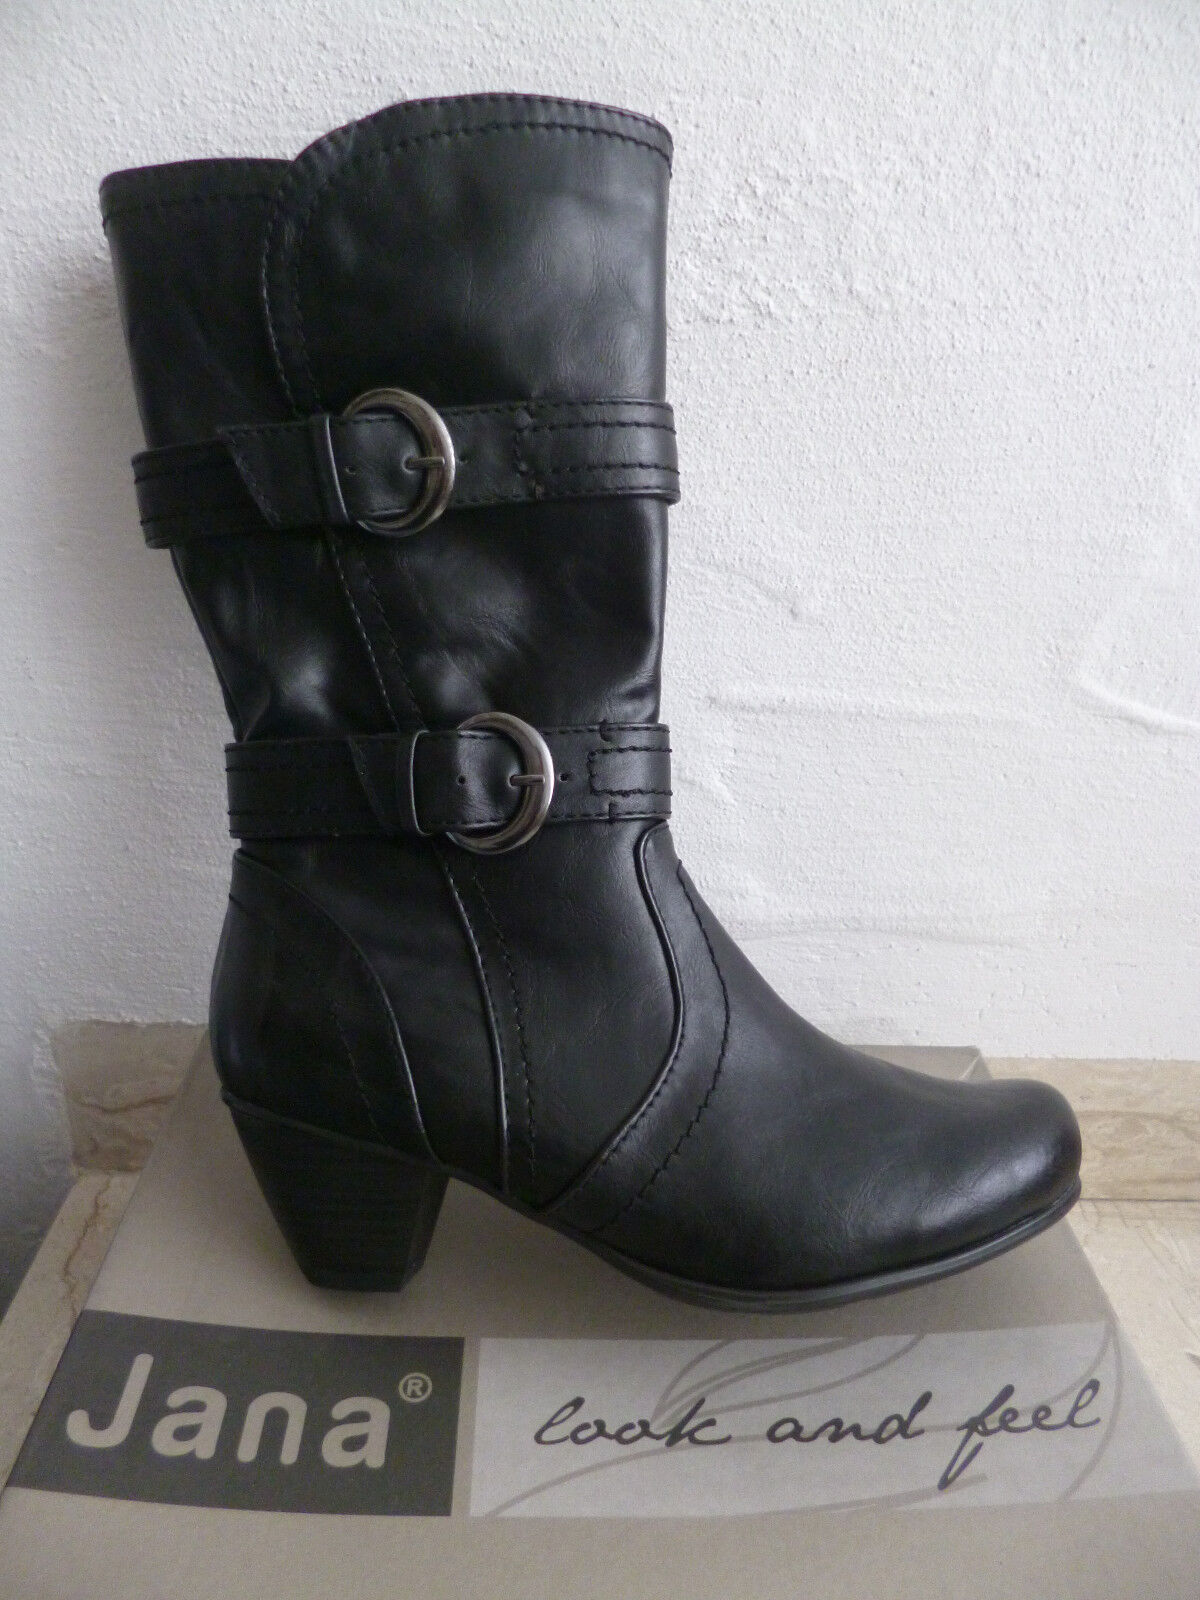 Jana Damen Stiefel Stiefeletten Stiefelette schwarz NEU